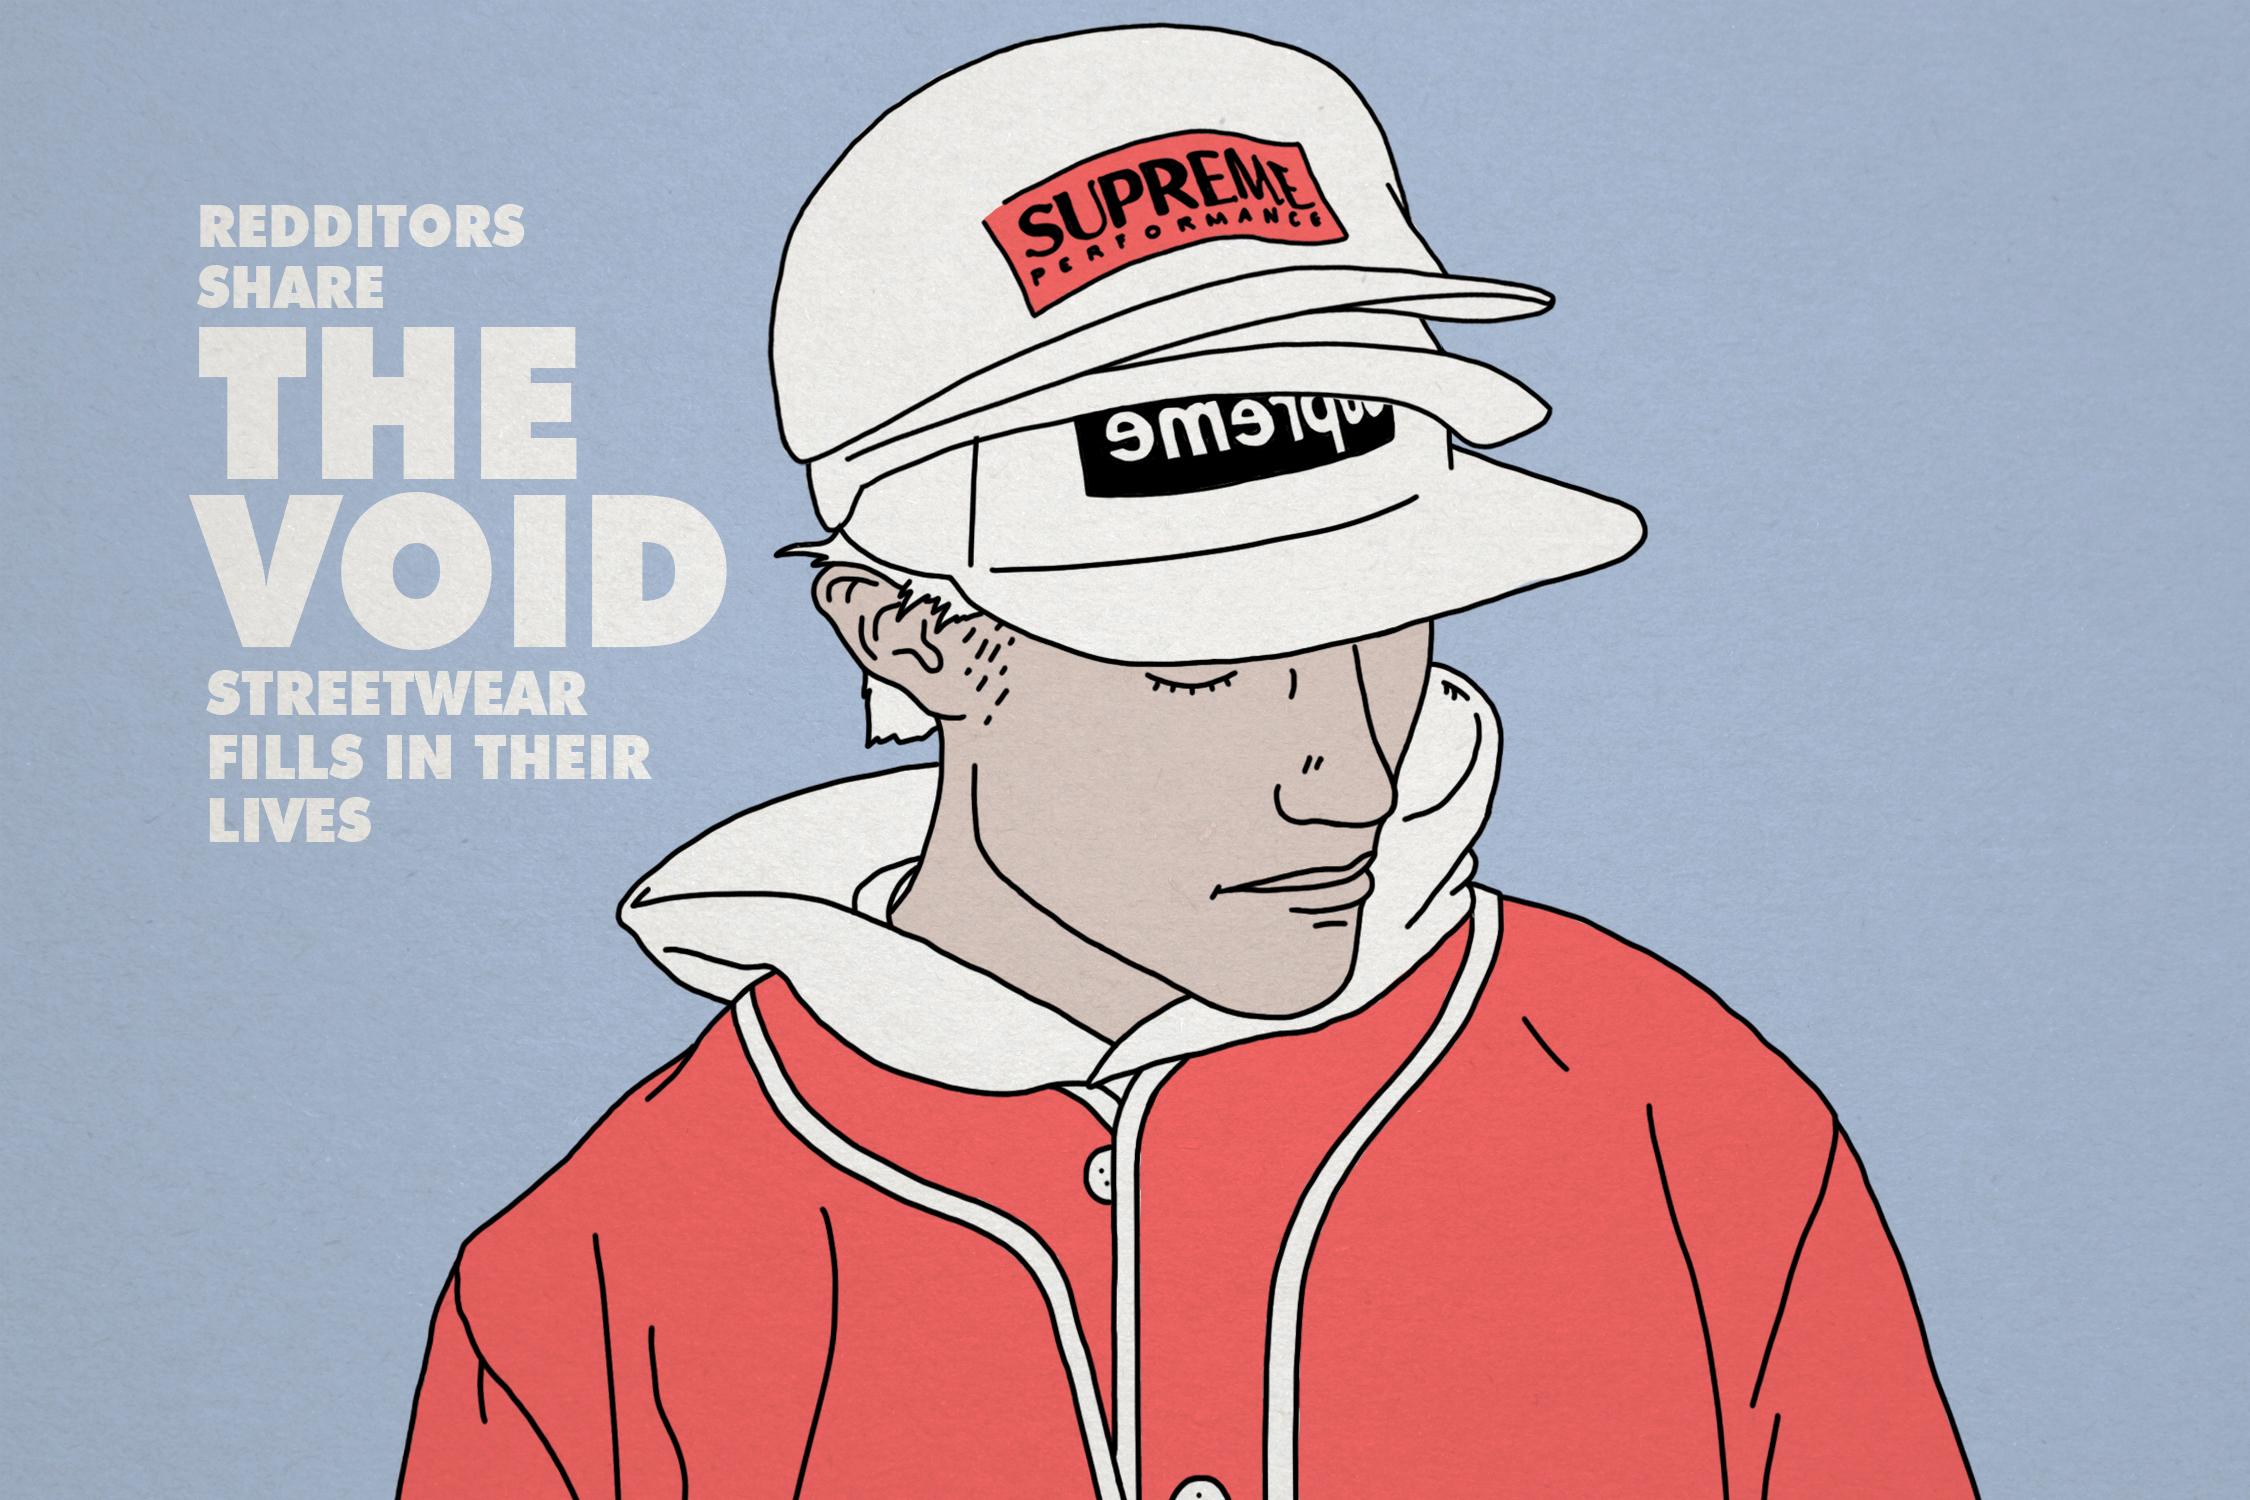 Redditors Explain What Void Streetwear Fills in Their Lives